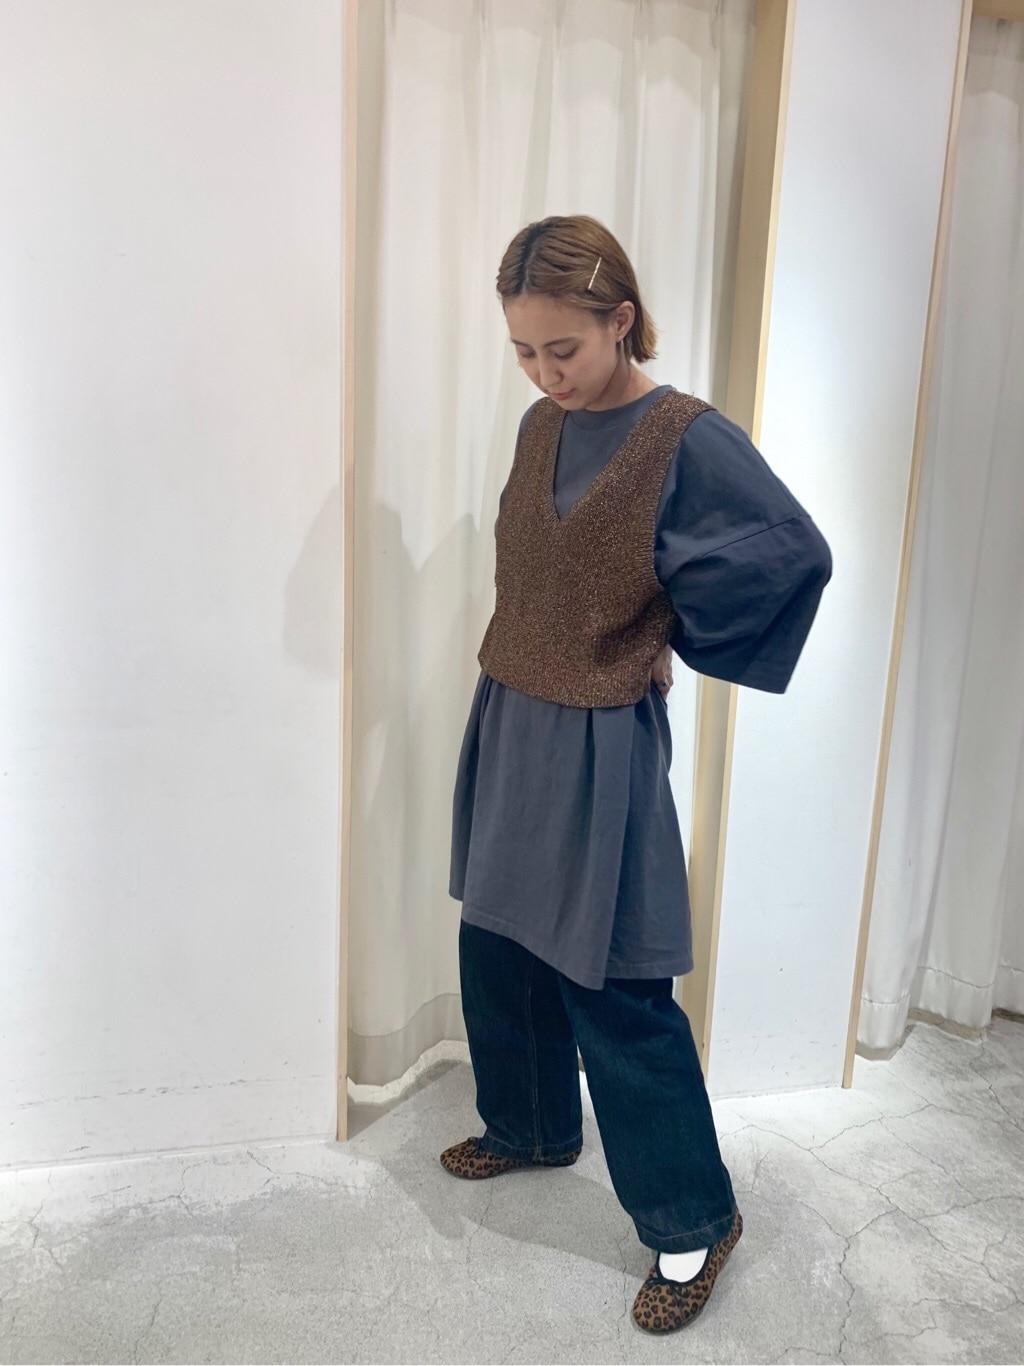 Dot and Stripes CHILD WOMAN ルミネ池袋 身長:155cm 2019.08.29